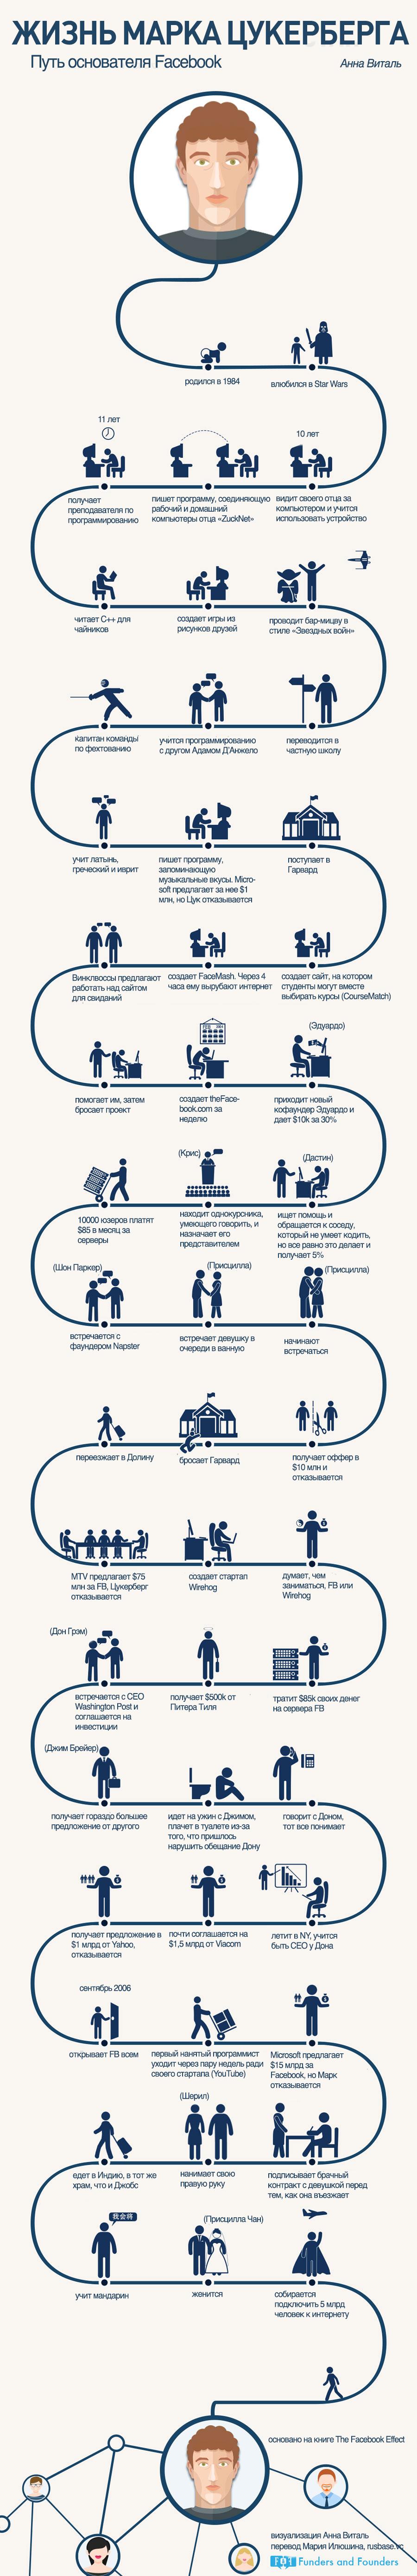 Жизнь Марка Цукерберга - инфографика